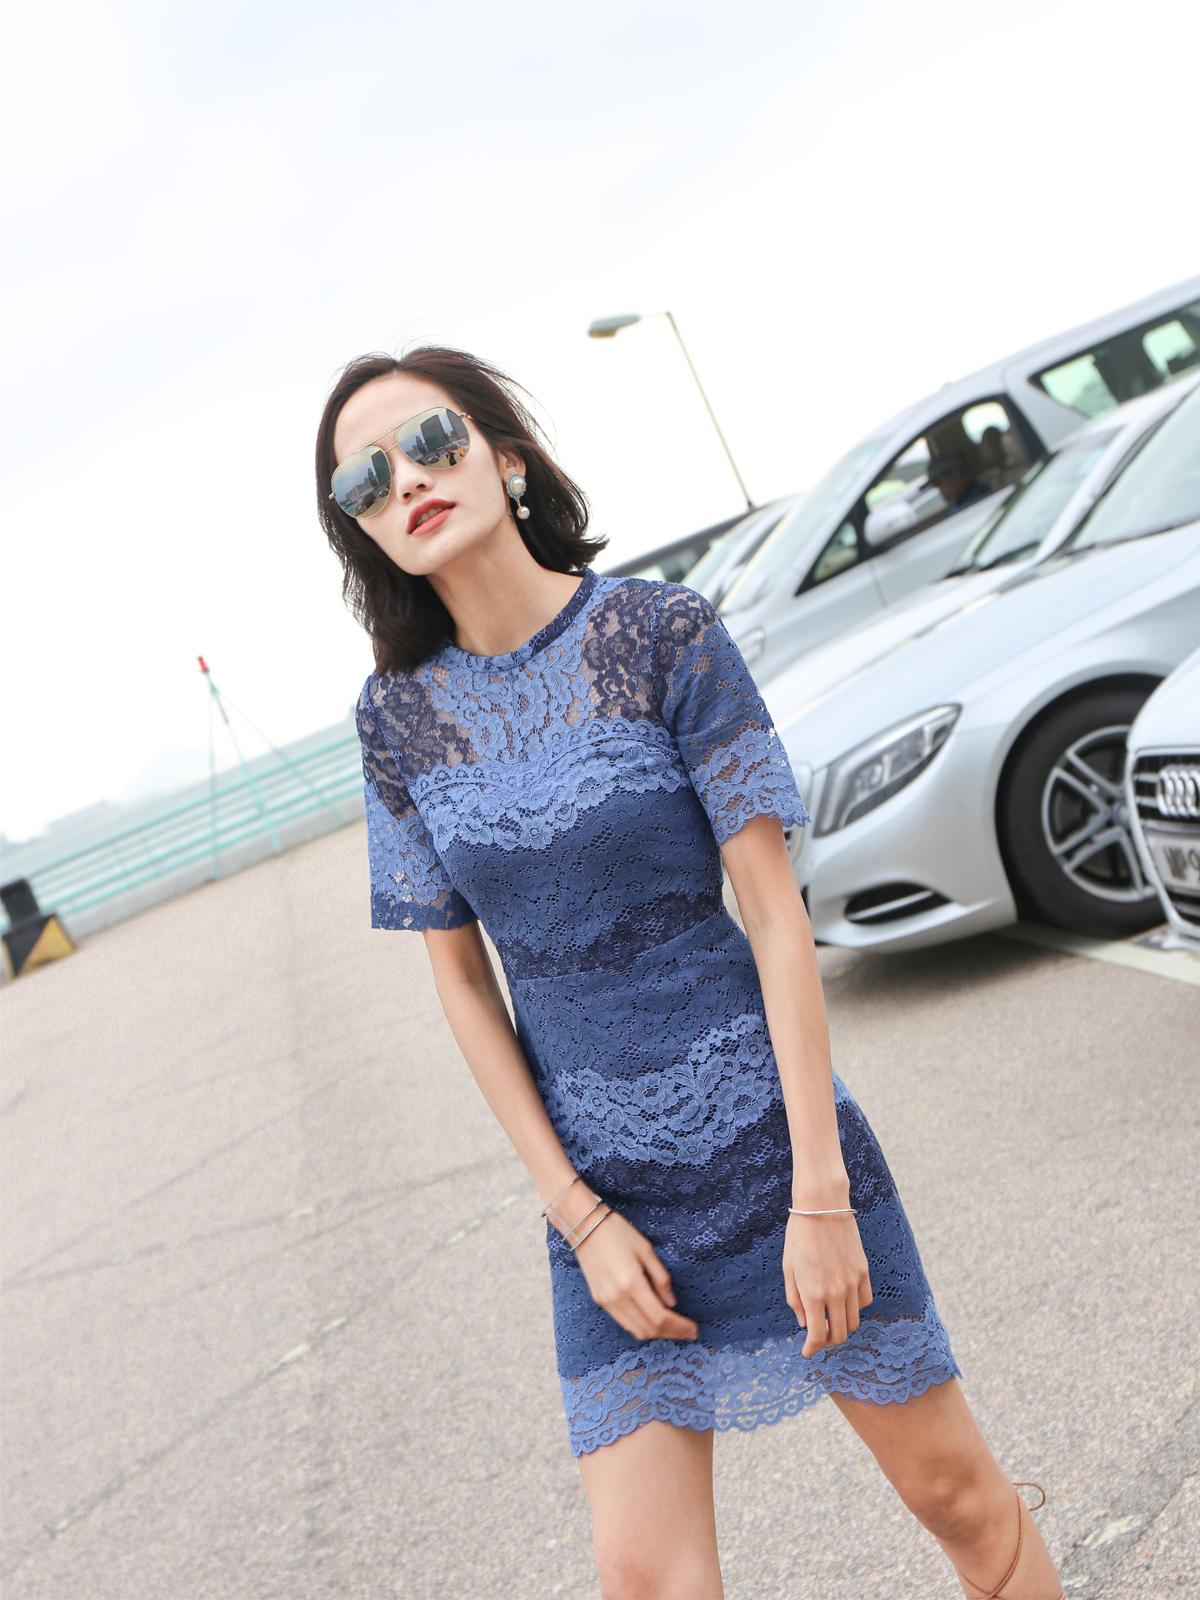 MRG-STUDIO 夏季蓝色水溶蕾丝修身连衣裙女 韩版甜美